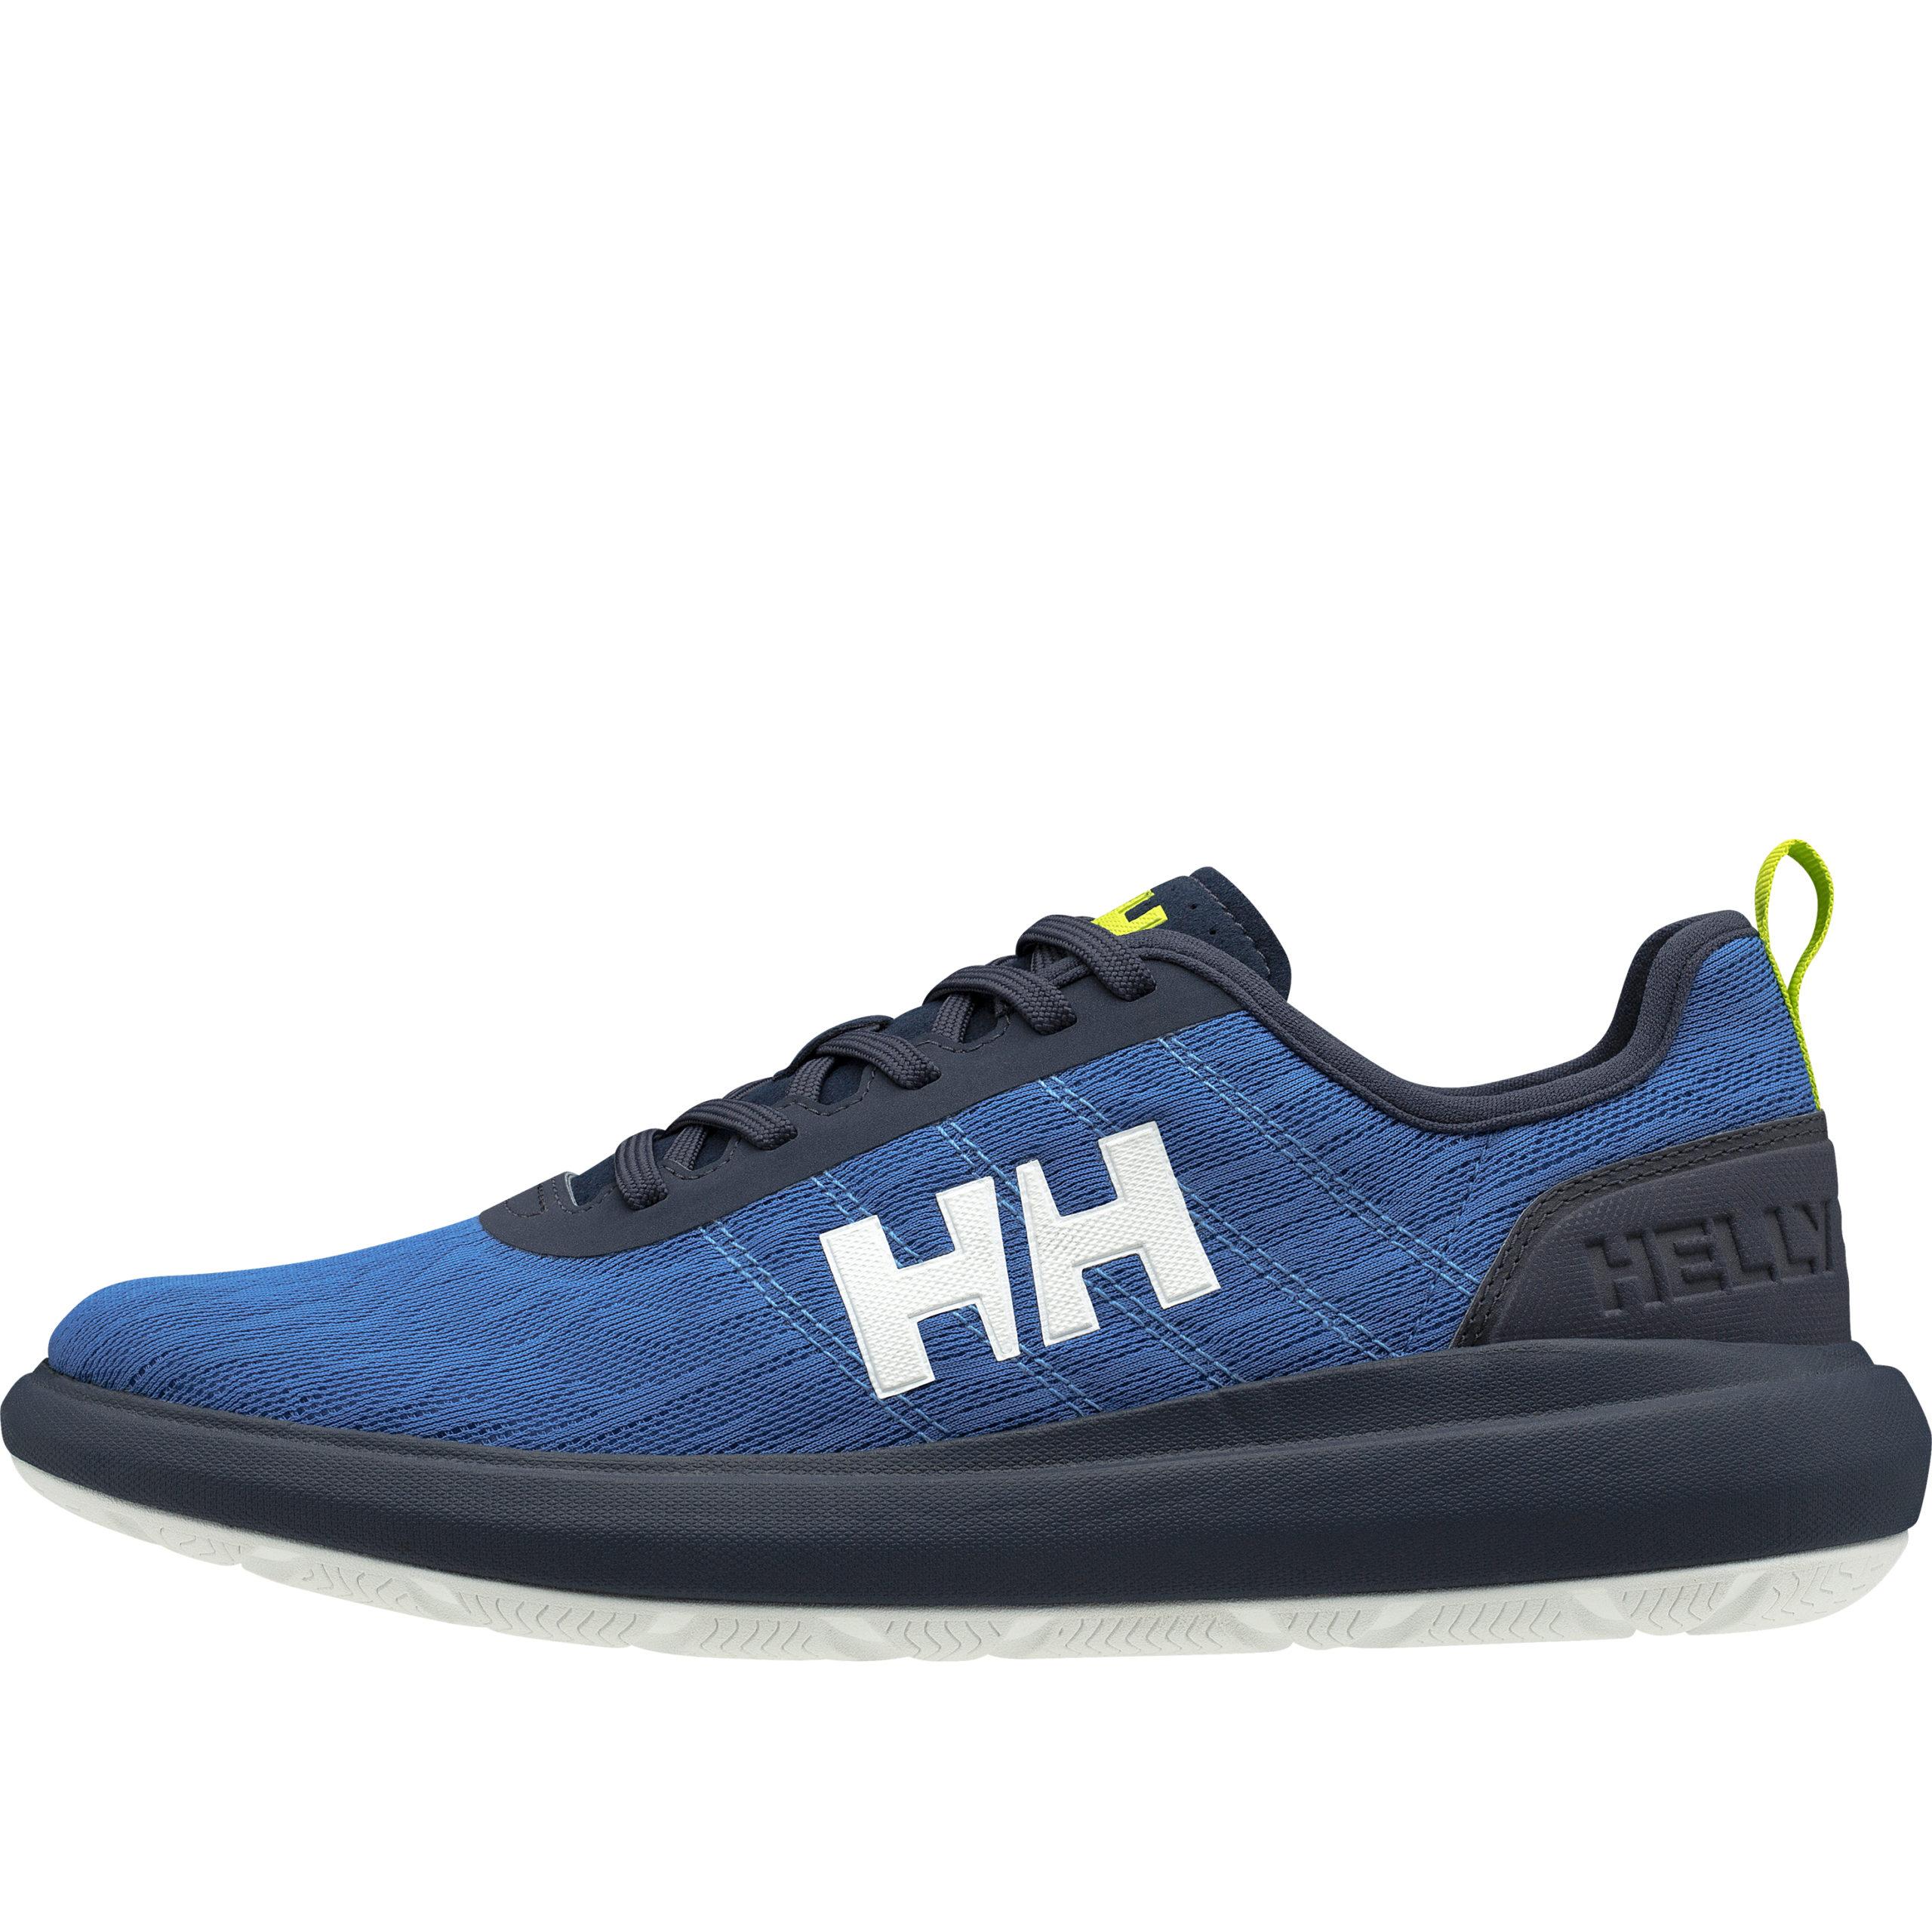 Helly Hansen Mens Spindrift Shoe V2 Watersports Shoe | Big Weather Gear |  Helly Hansen Newport